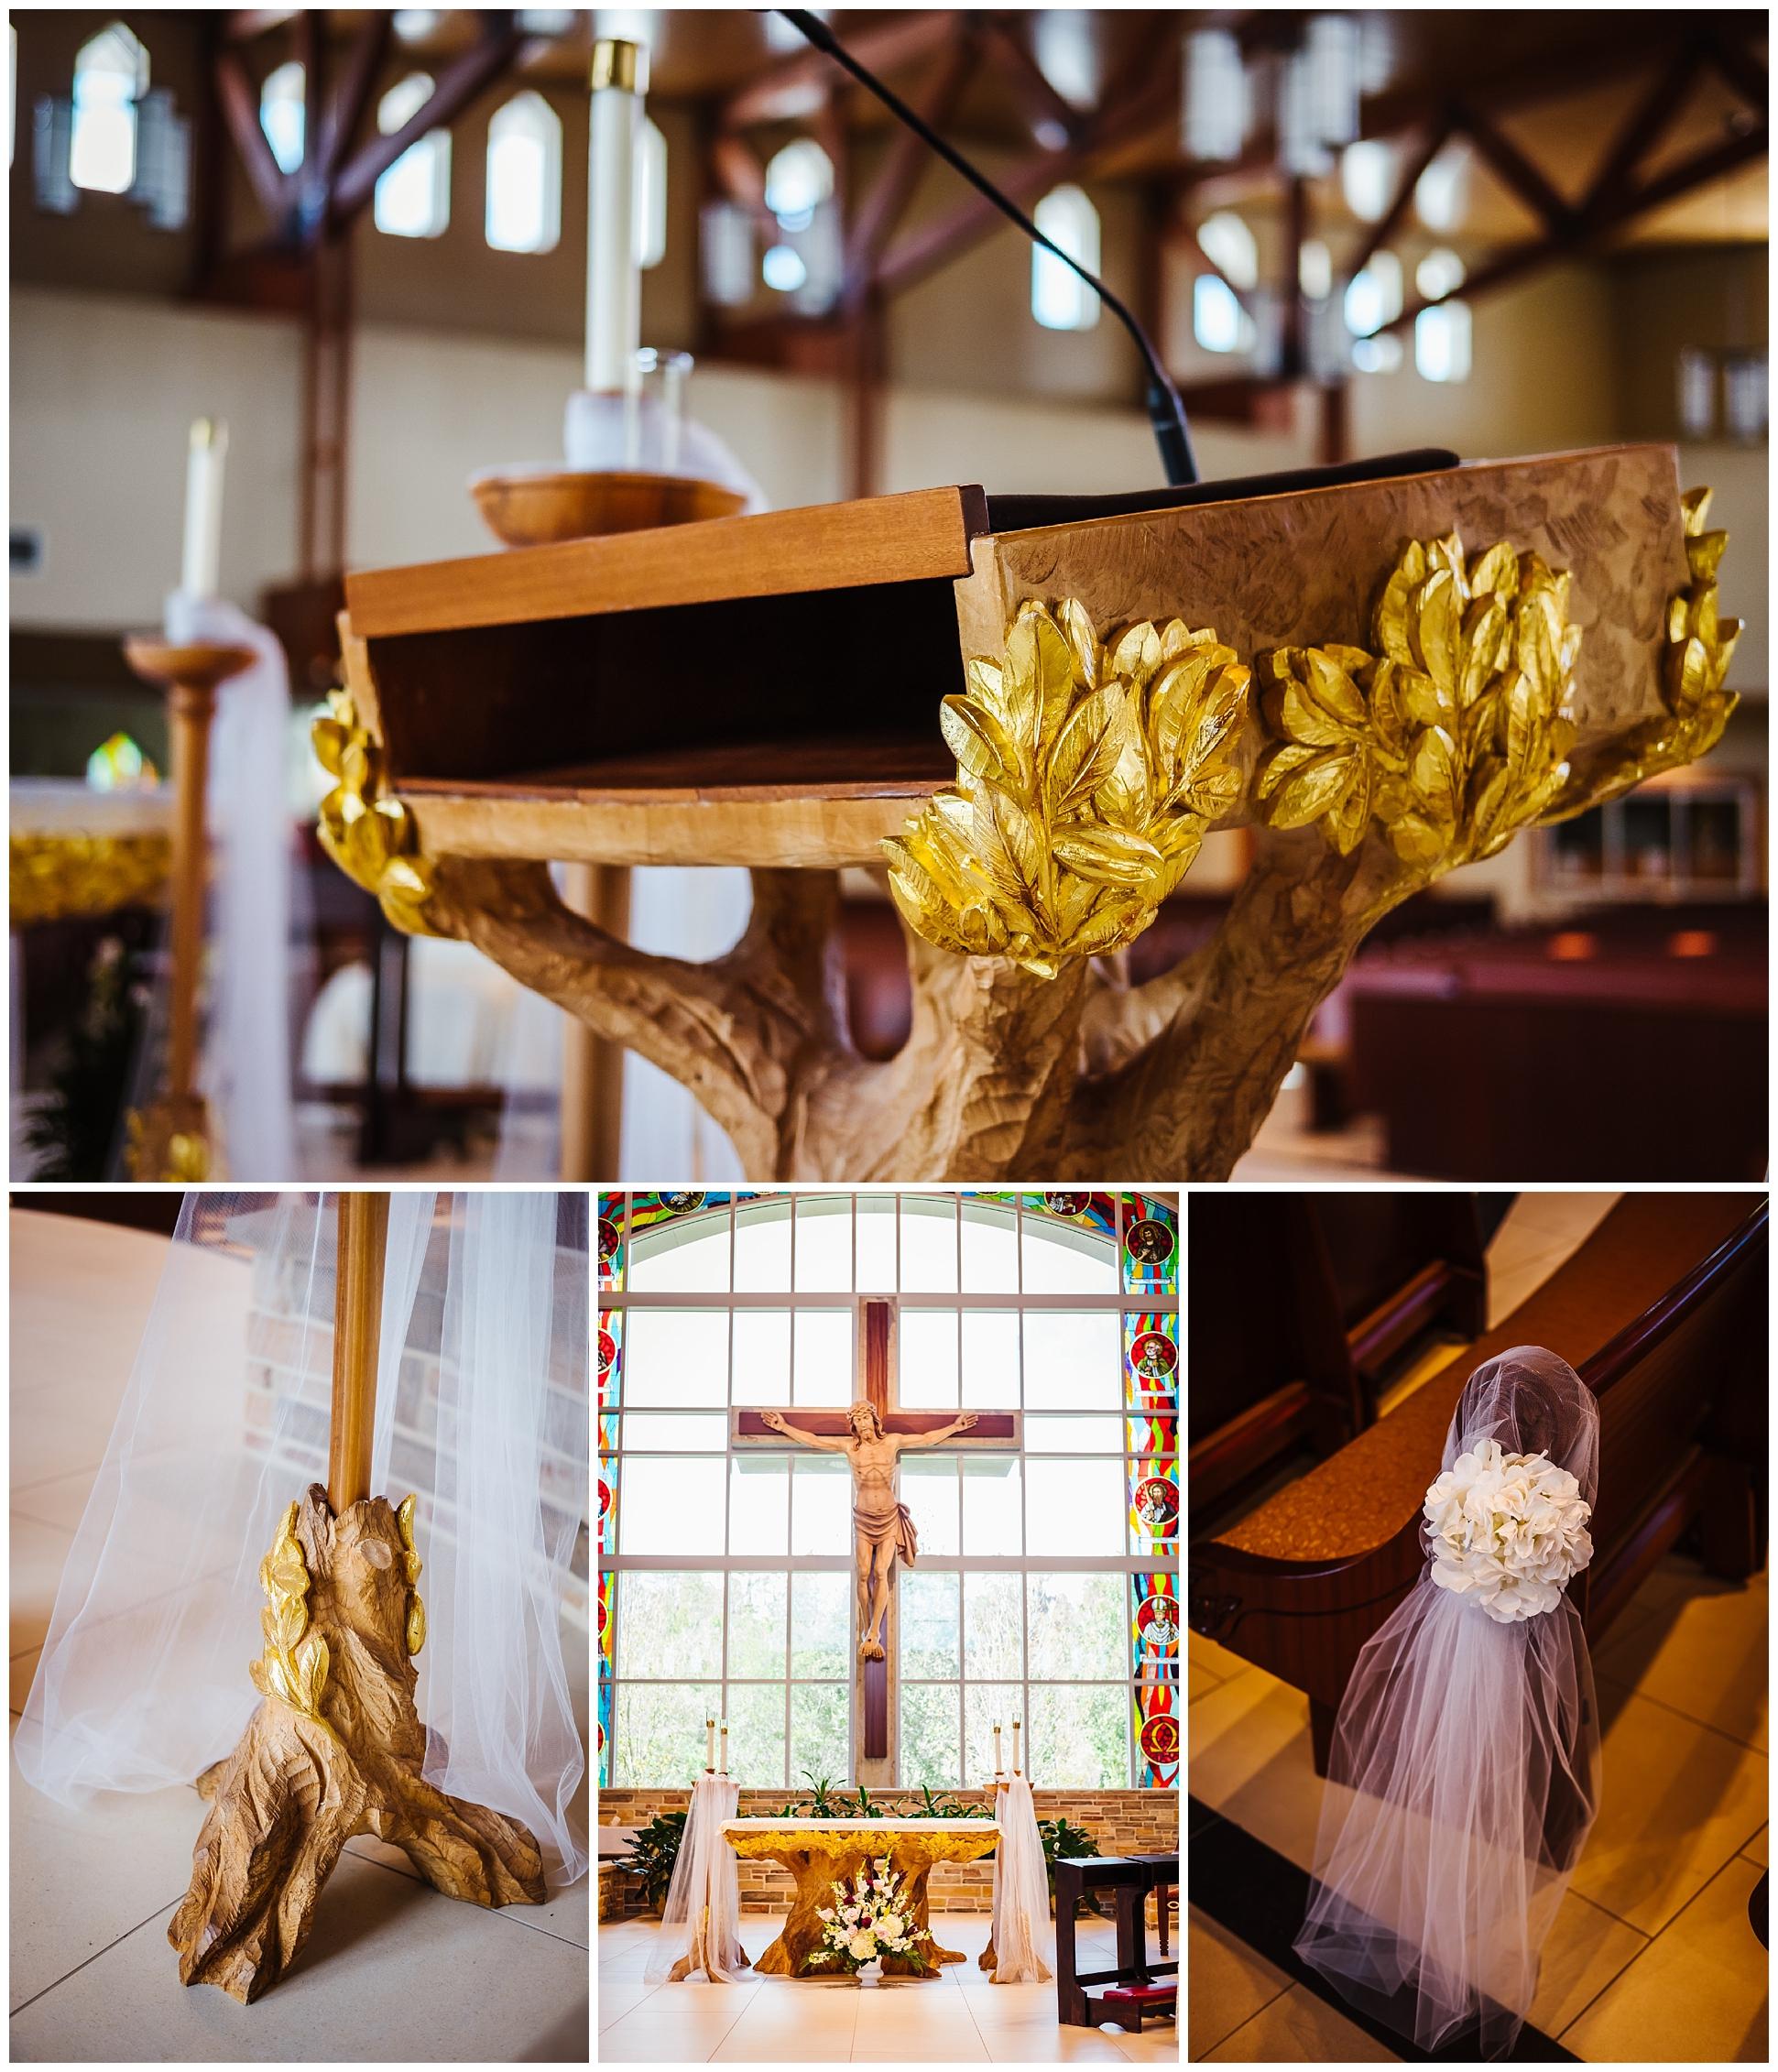 tampa-wedding-photographer-philipino-colorful-woods-ballroom-church-mass-confetti-fuscia_0019.jpg